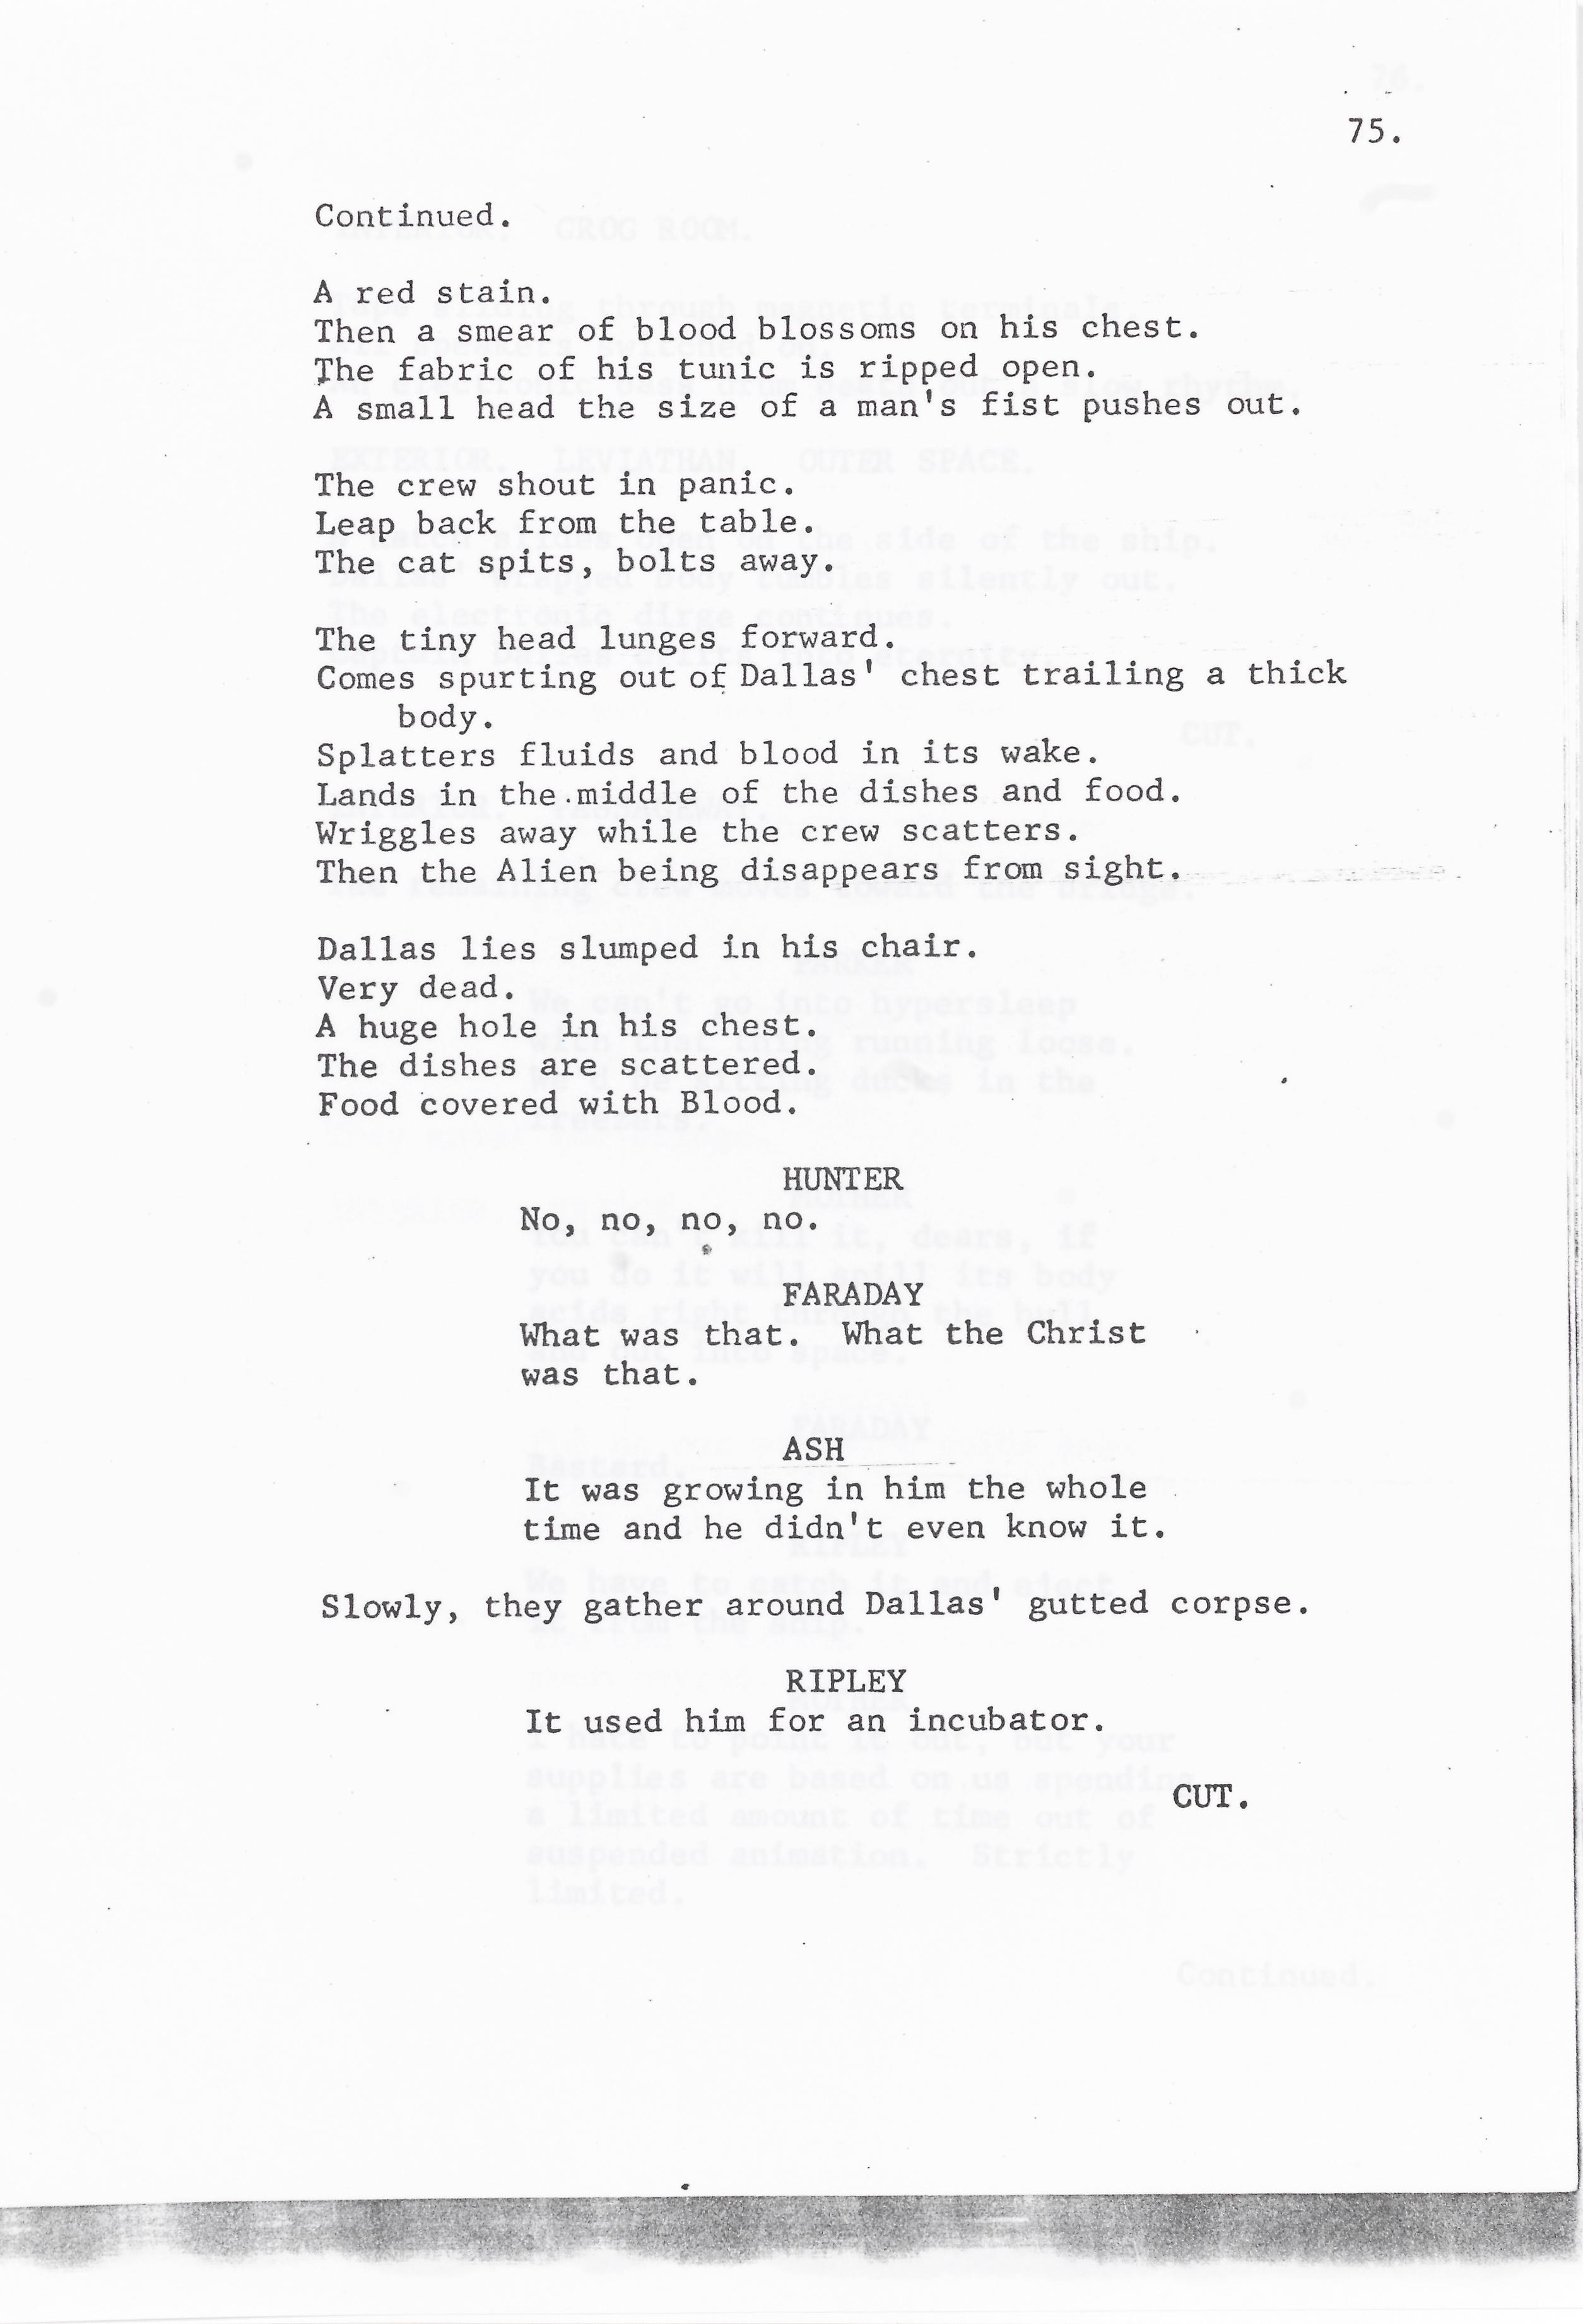 Lot 33 - Alien: A Revised First Draft Script, circa 1978,